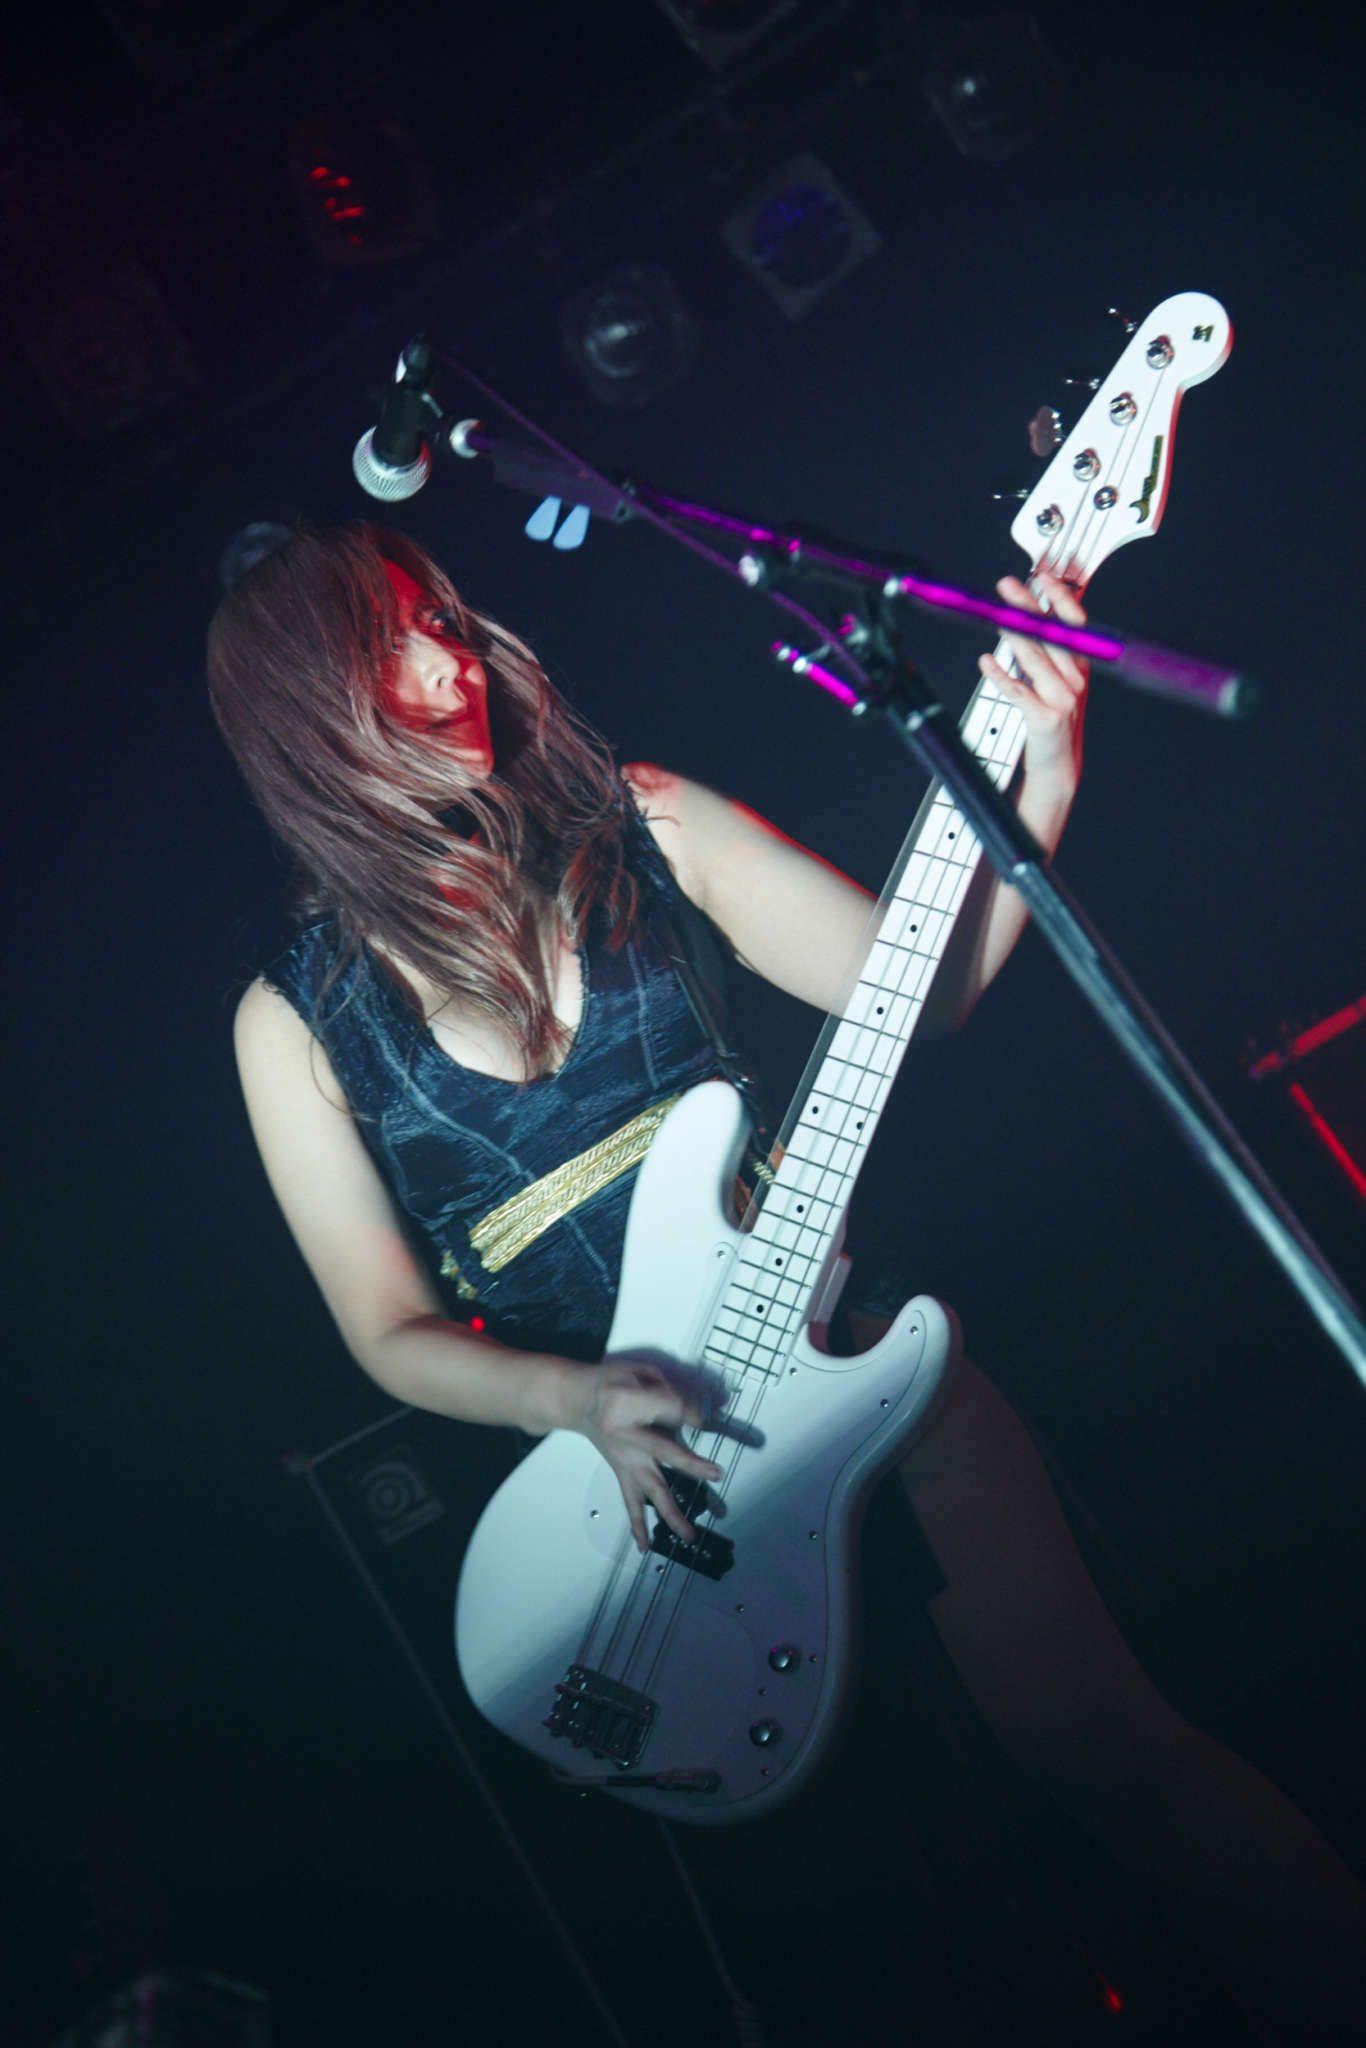 La bassiste, - Photographe : Nakano Shuuya (中野修也)